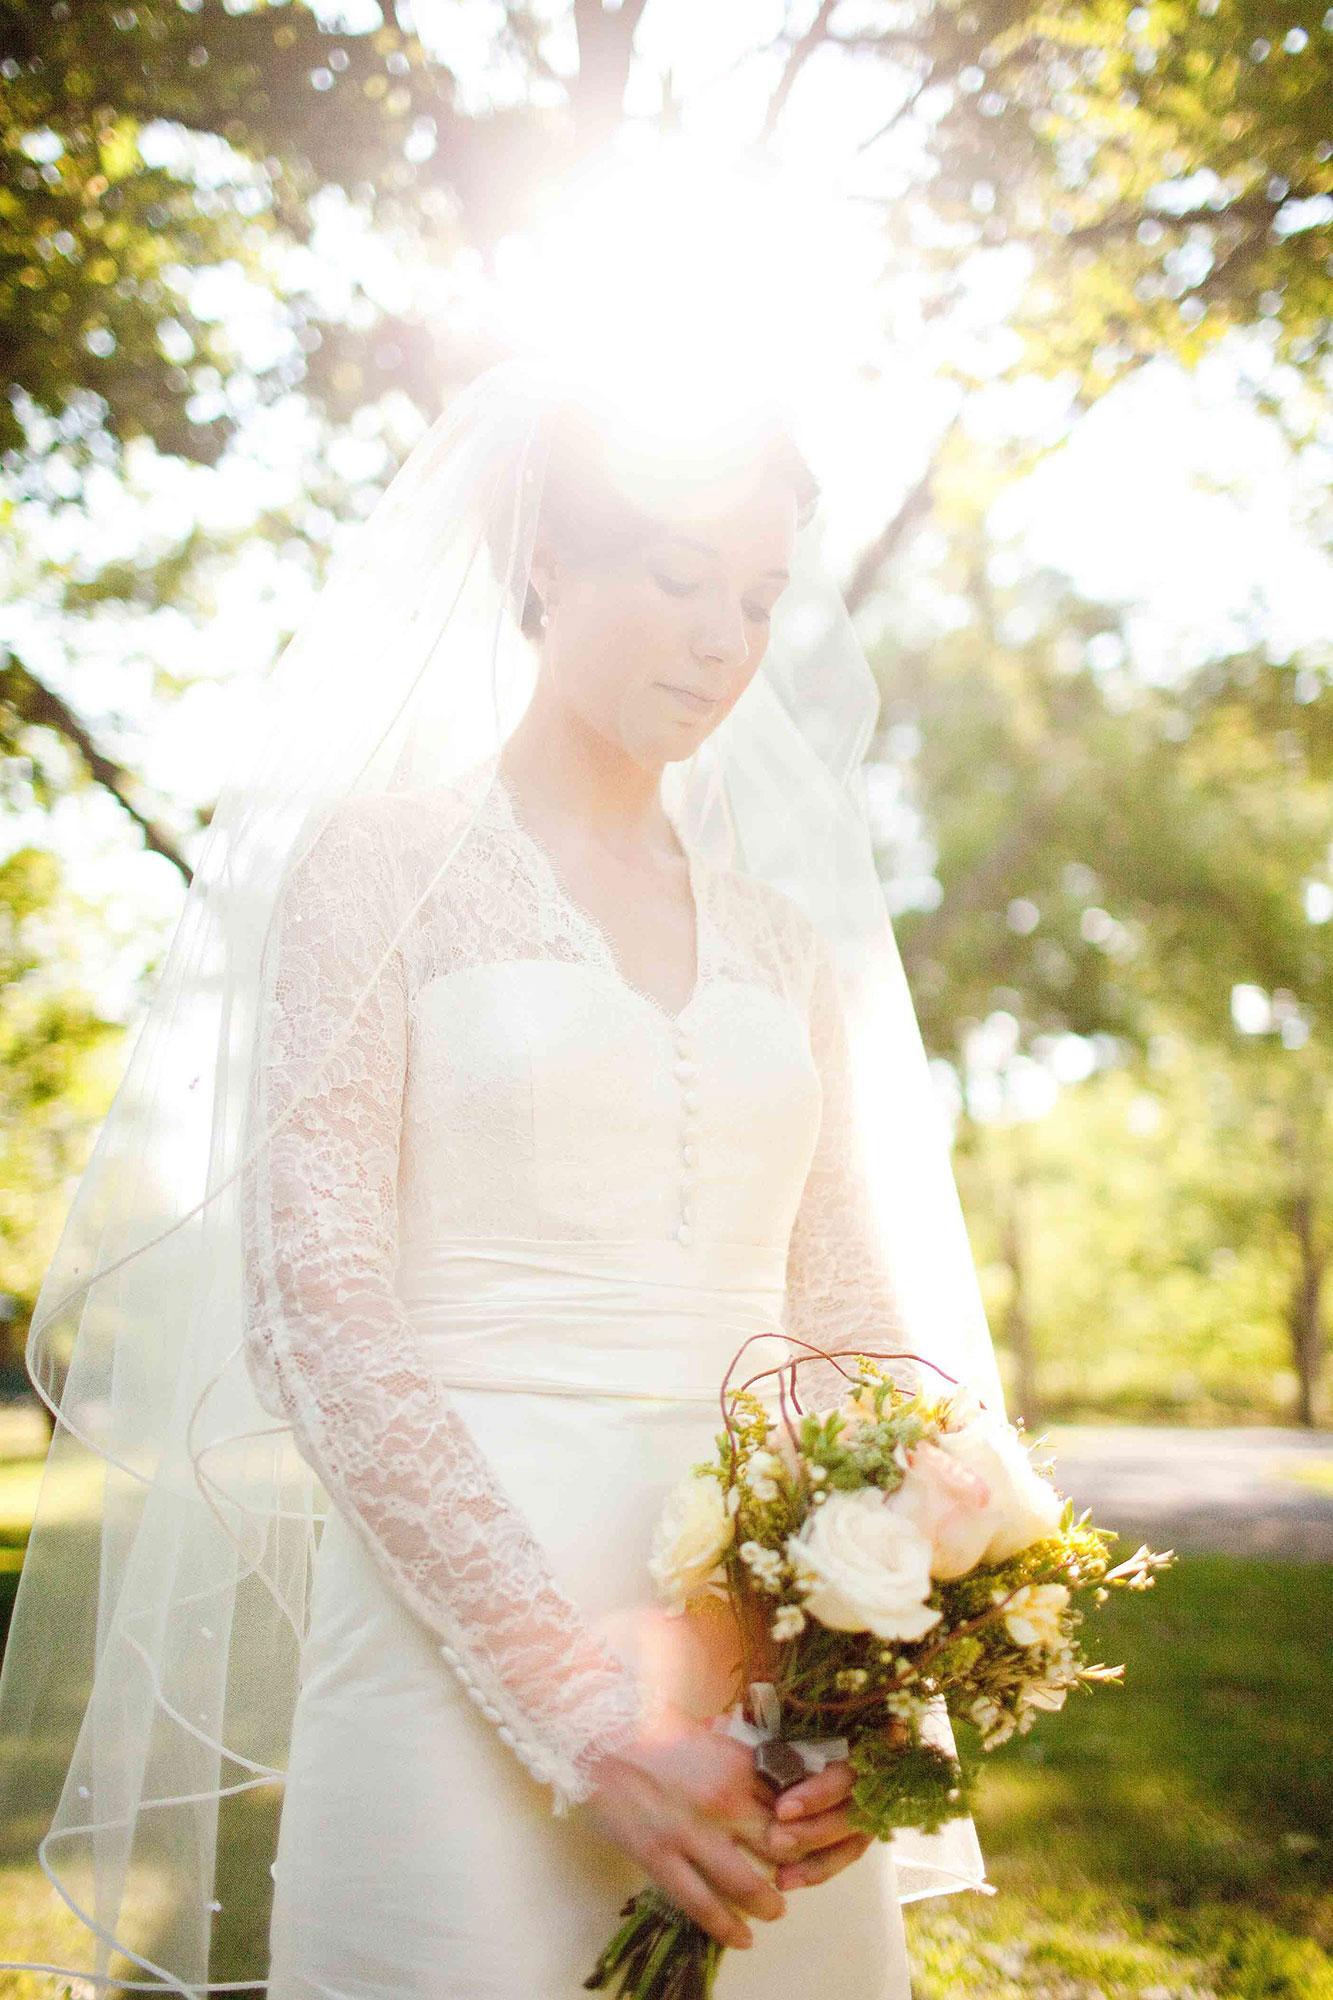 Amanda-Cowley-Willowbank-Vineyard-Bride-Photo-By-White-Photographie-022.jpg